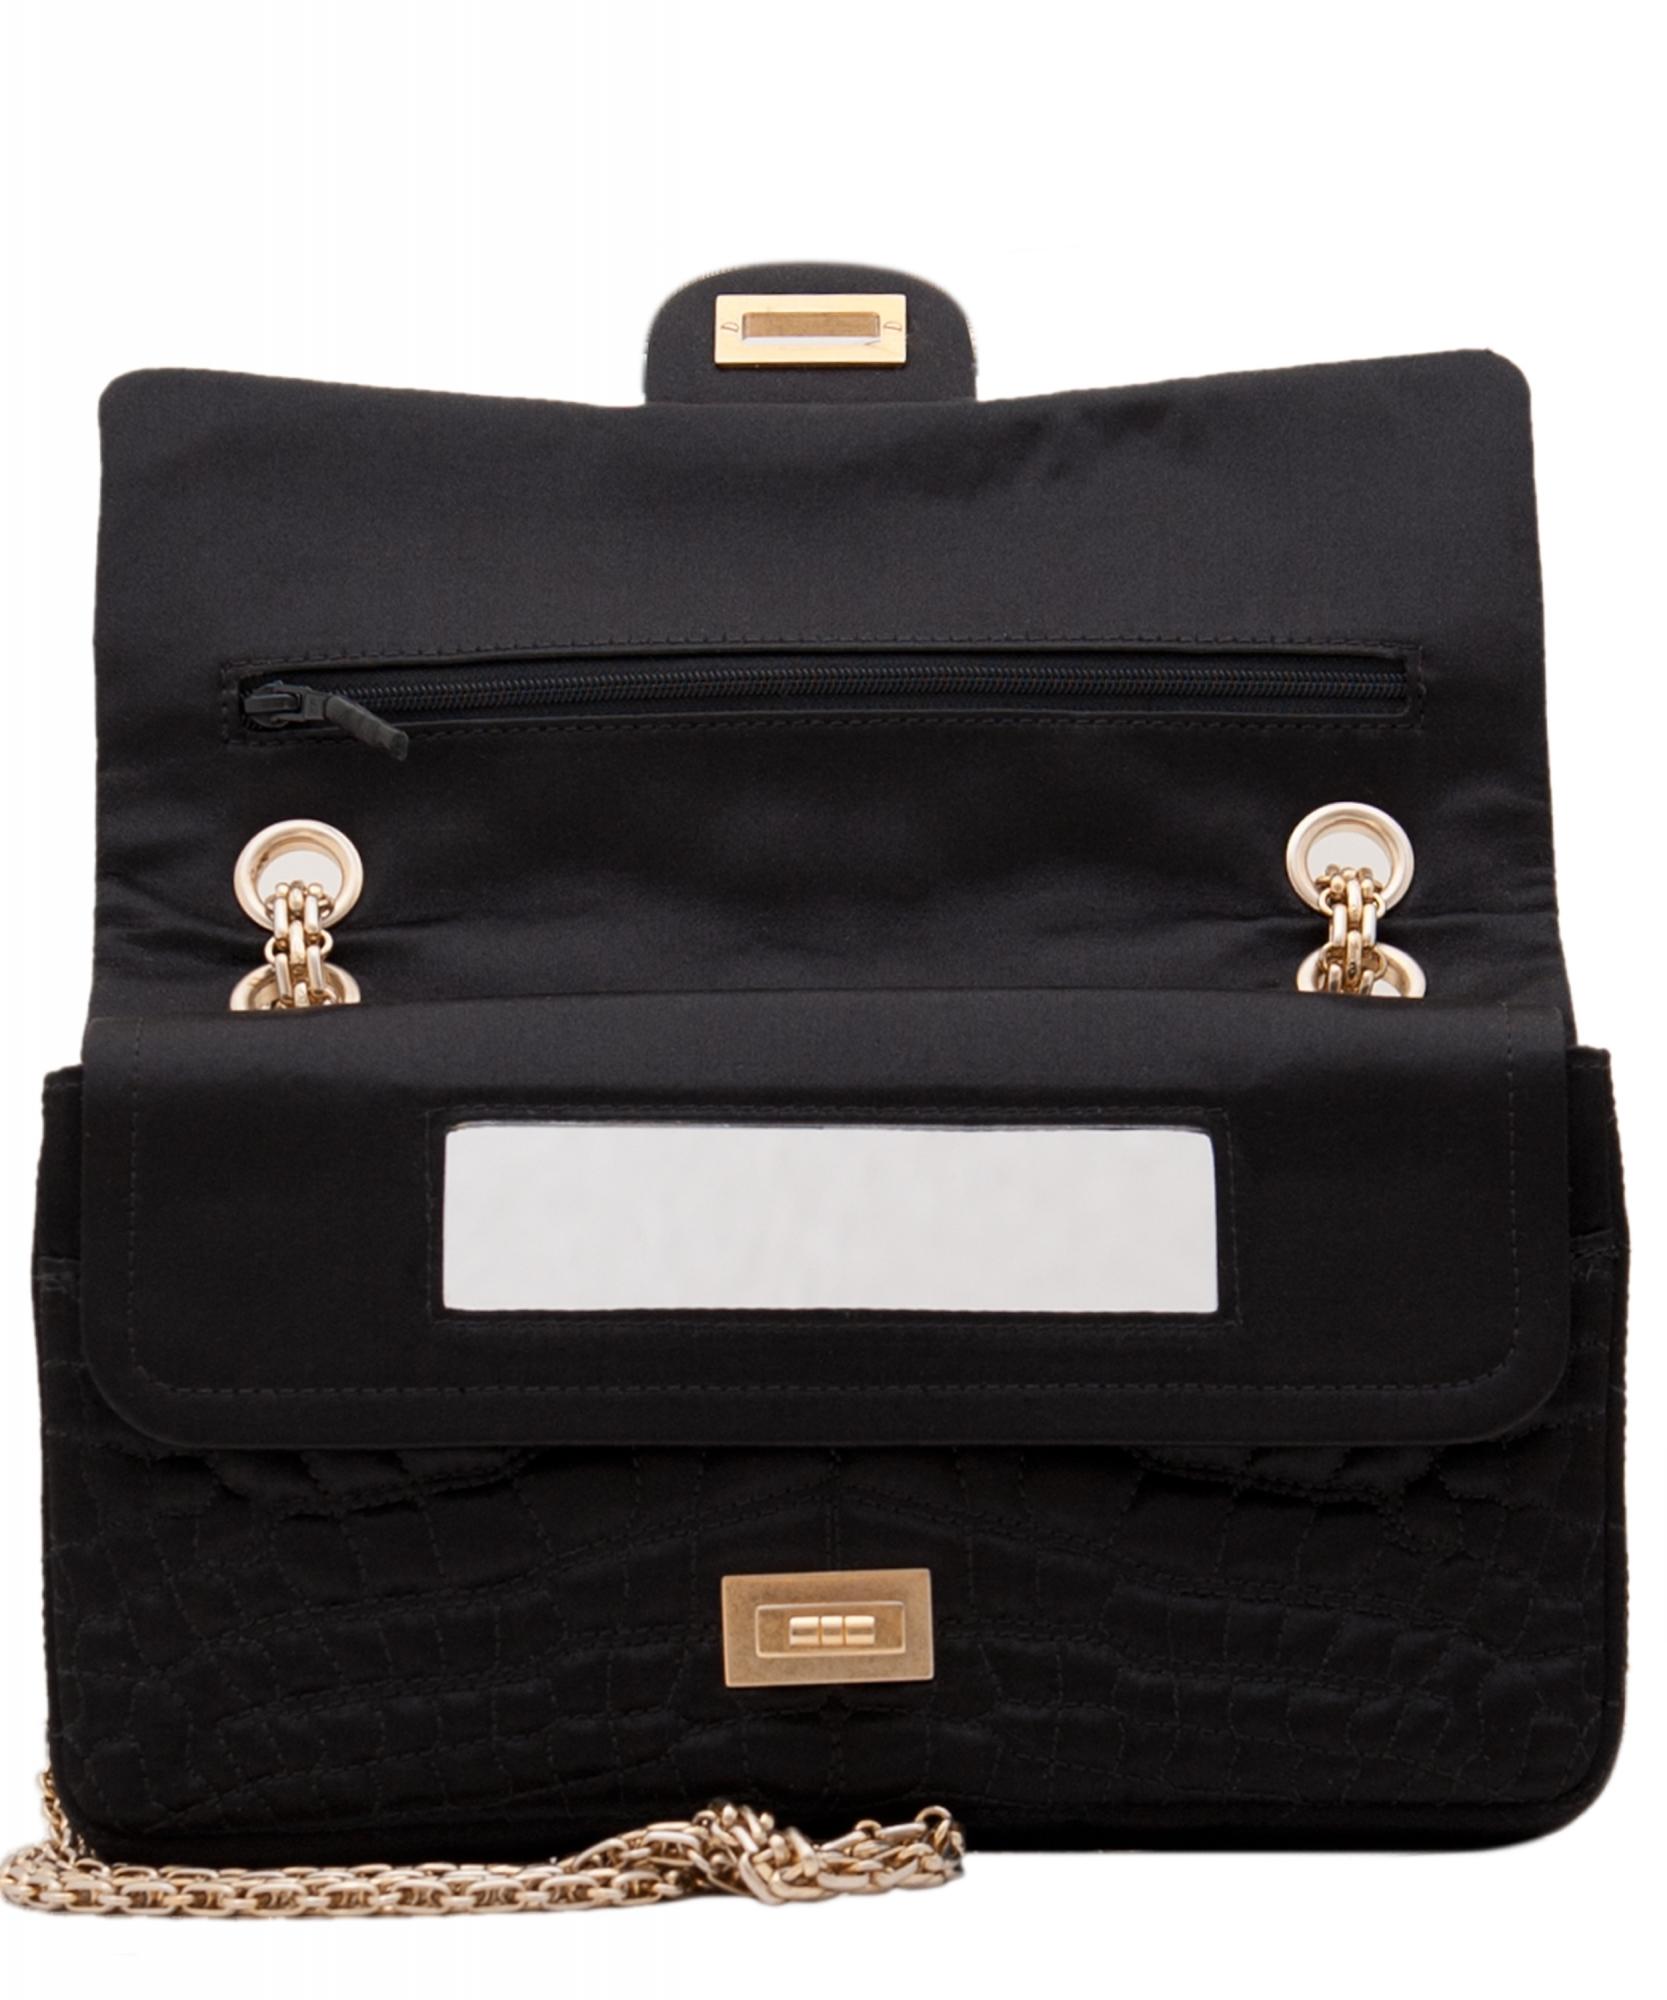 2dfb9d64cc2e ... Shoulder Bags; Chanel Black Satin Croc Embossed 2.55 Reissue Flap Bag.  Touch to zoom